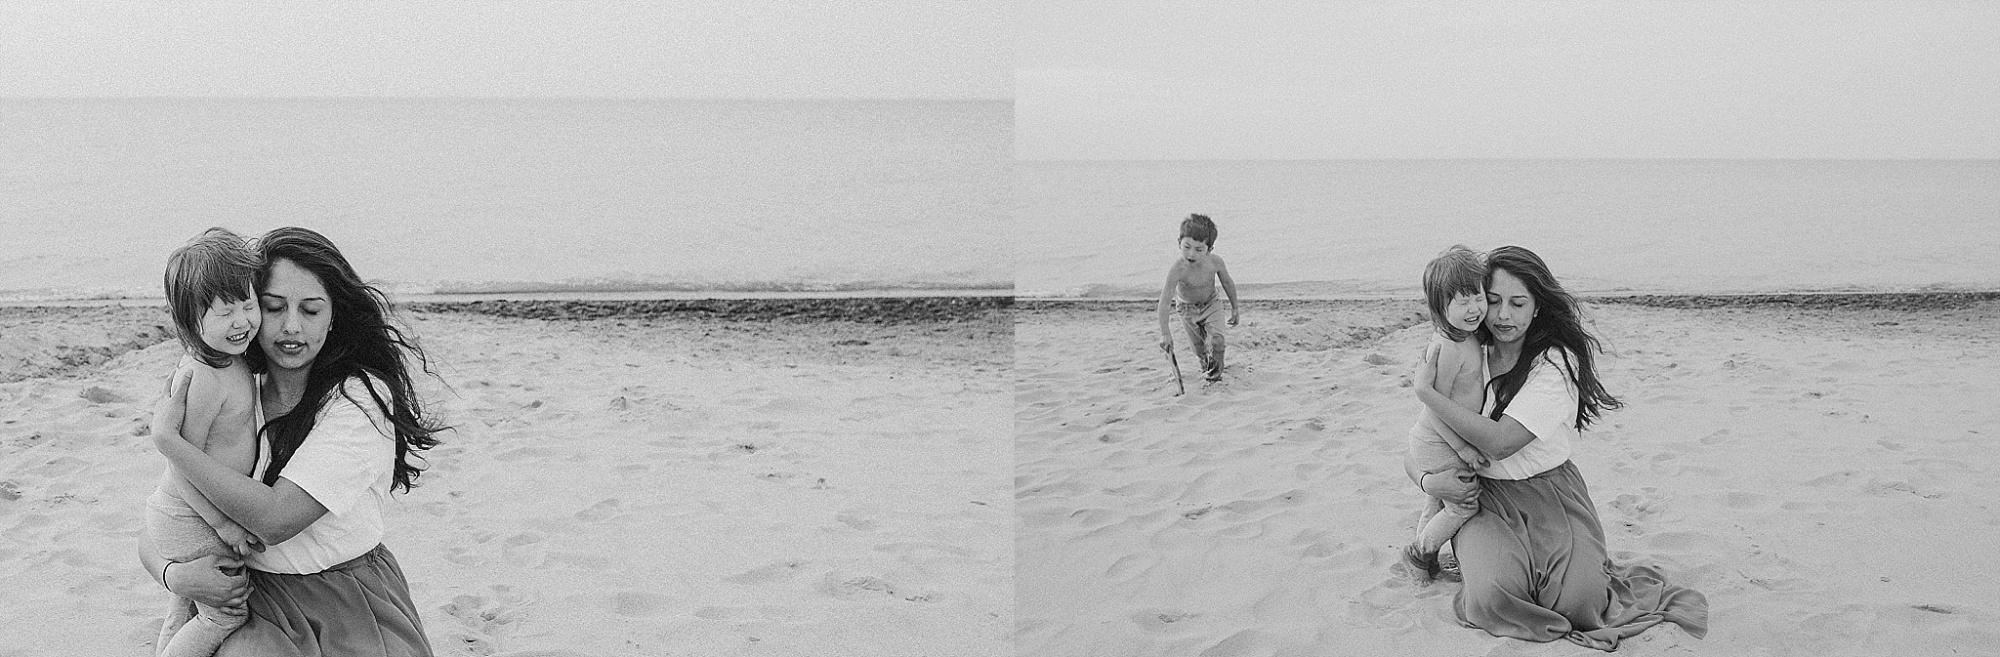 Chicago and west suburbs family photography Adri de la cruz photographer (7)